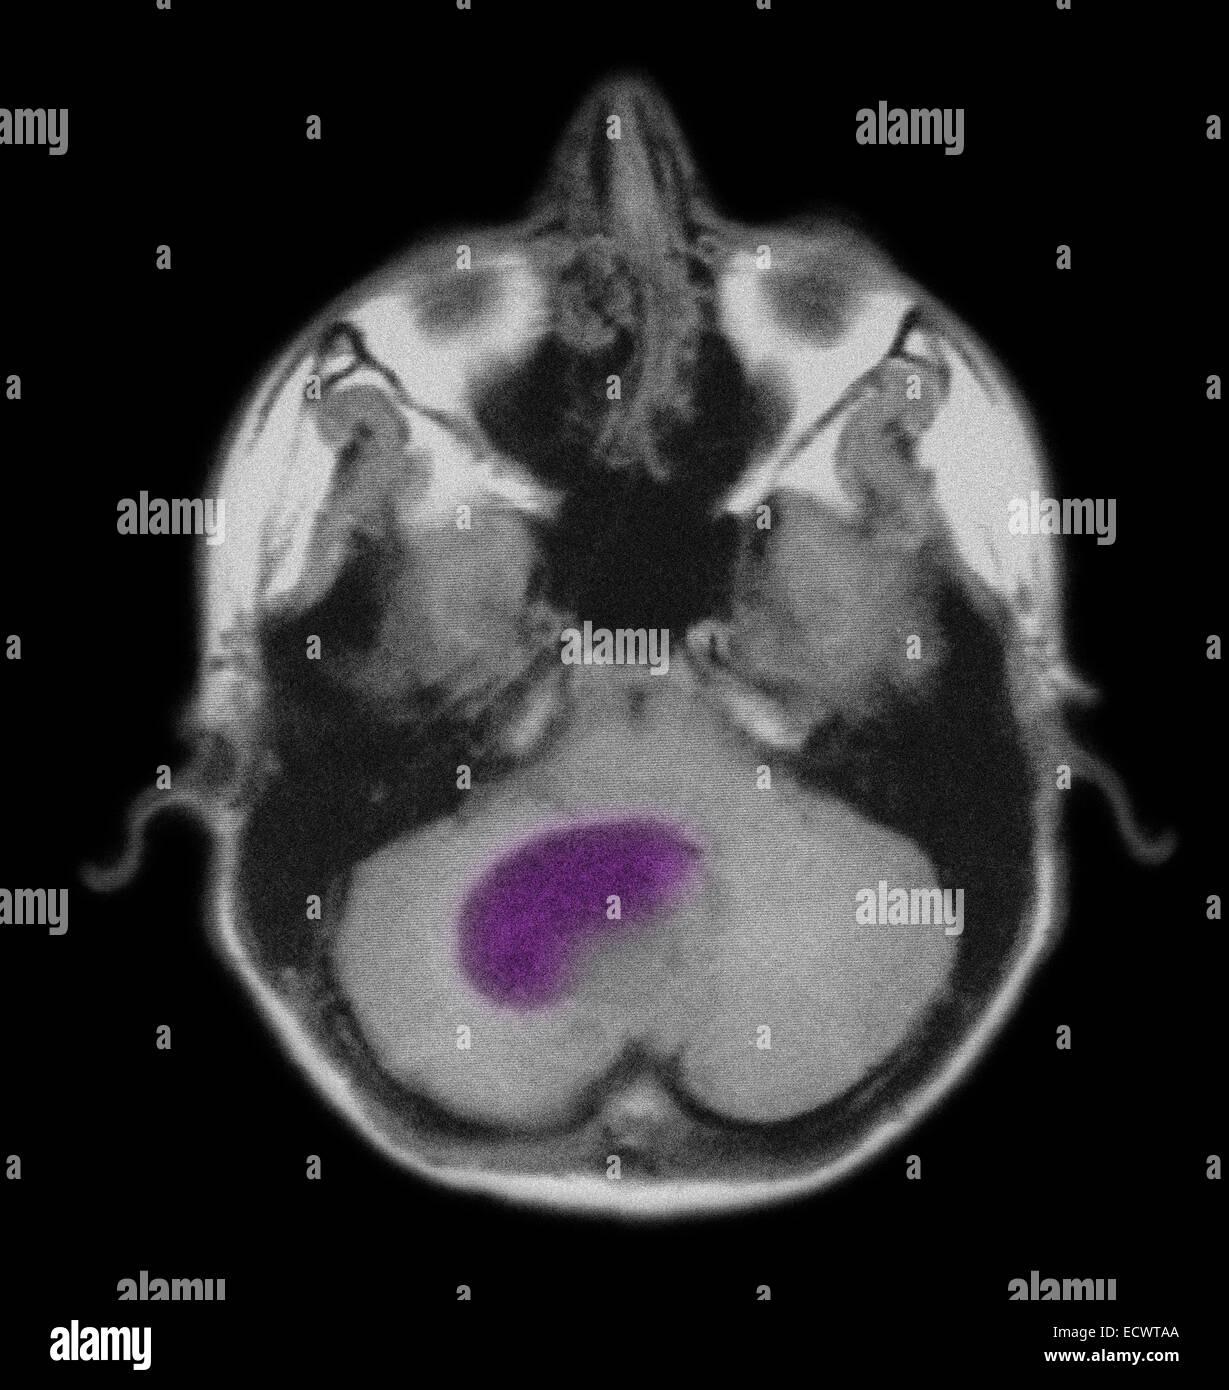 Mri Brain Tumor Stockfotos & Mri Brain Tumor Bilder - Alamy